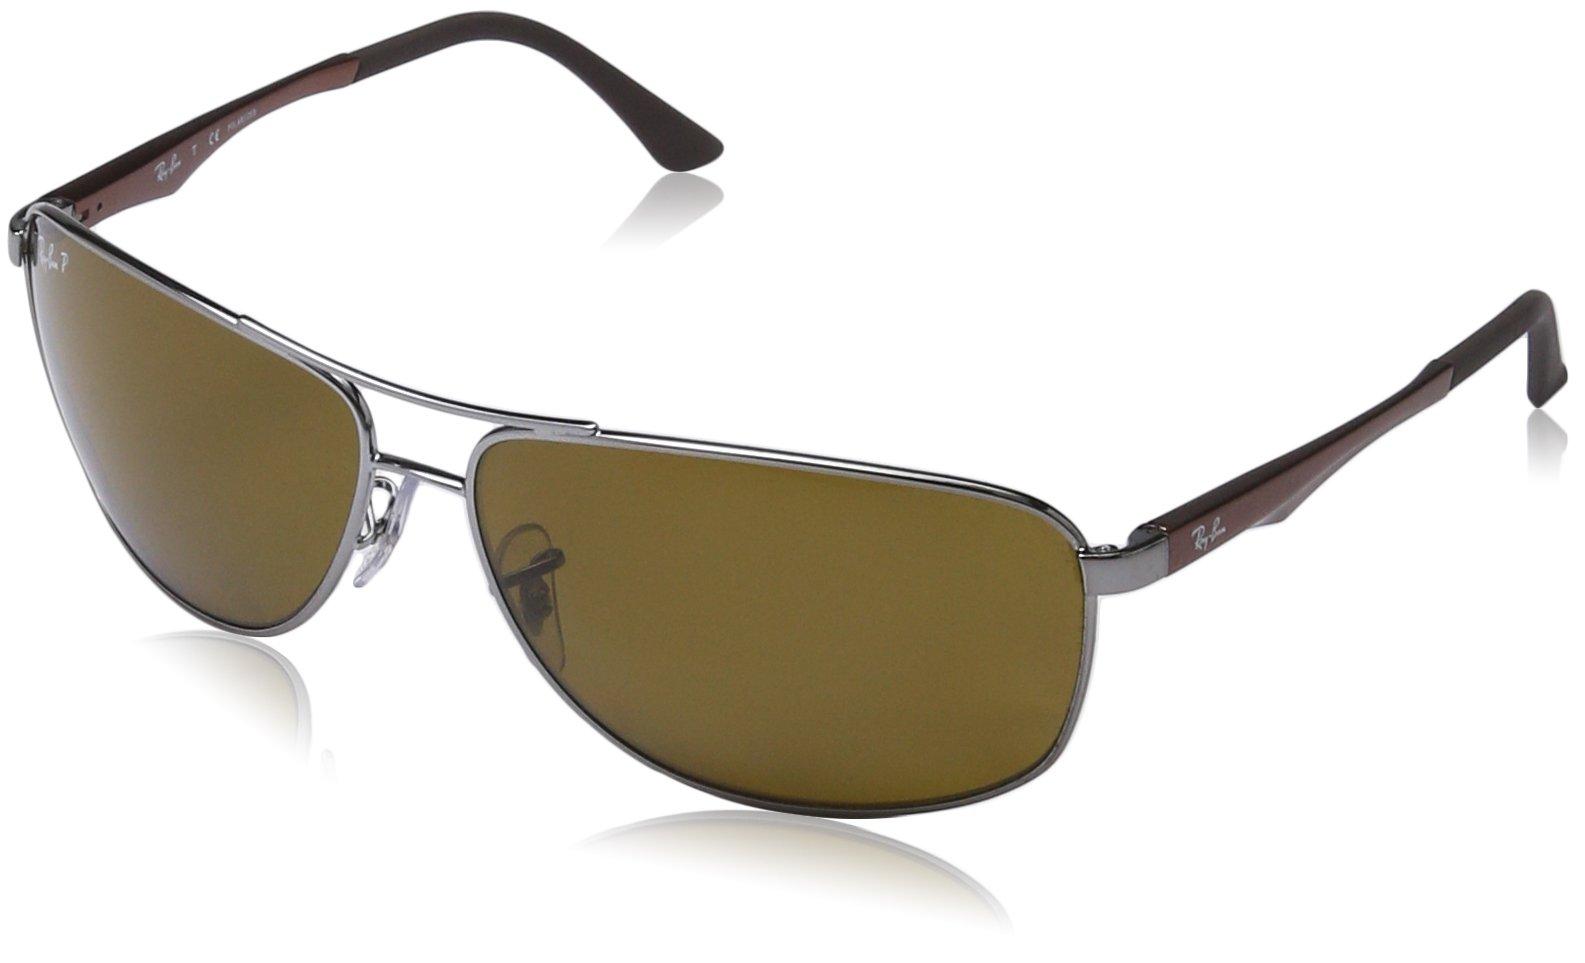 c62fd72887 Ray-Ban Men s 0RB3506 Rectangular Sunglasses Gunmetal POLAR BROWN ...